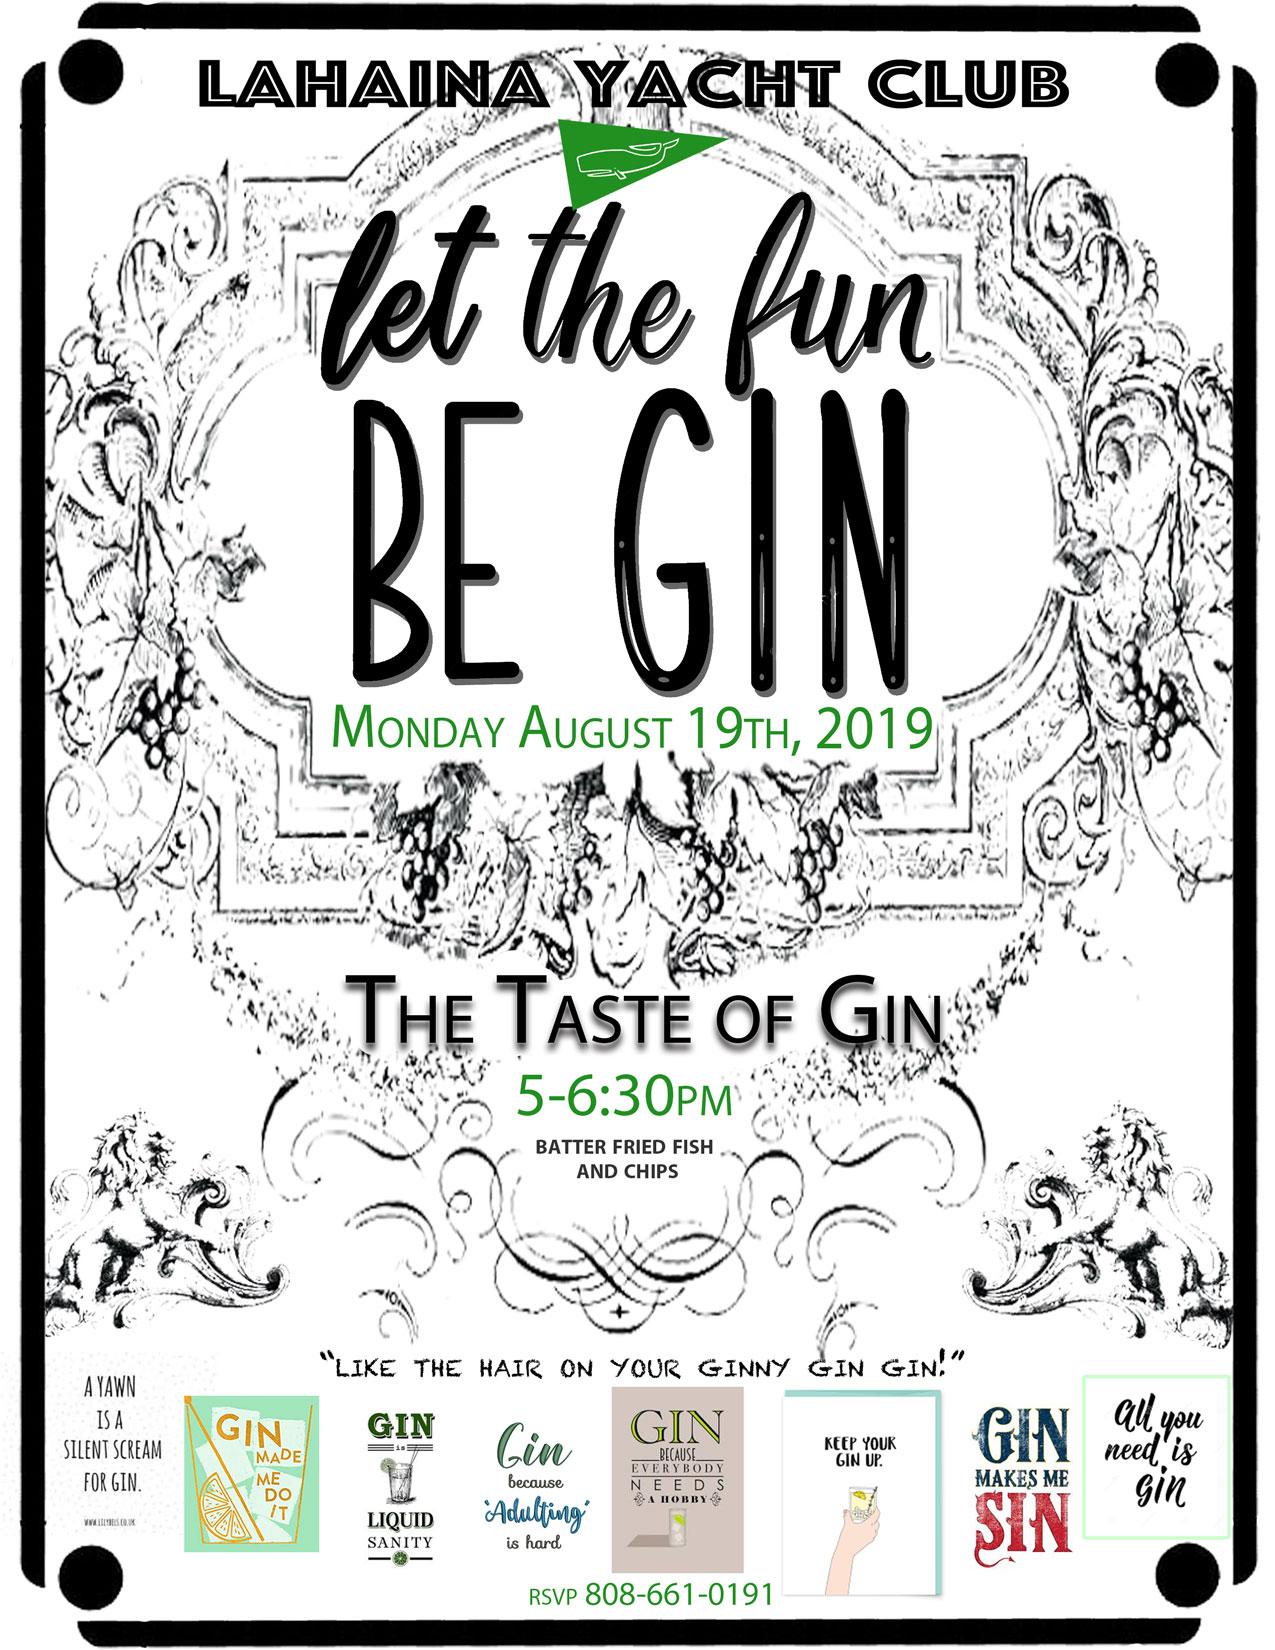 LYC-Gin-Tasting-2019web.jpg